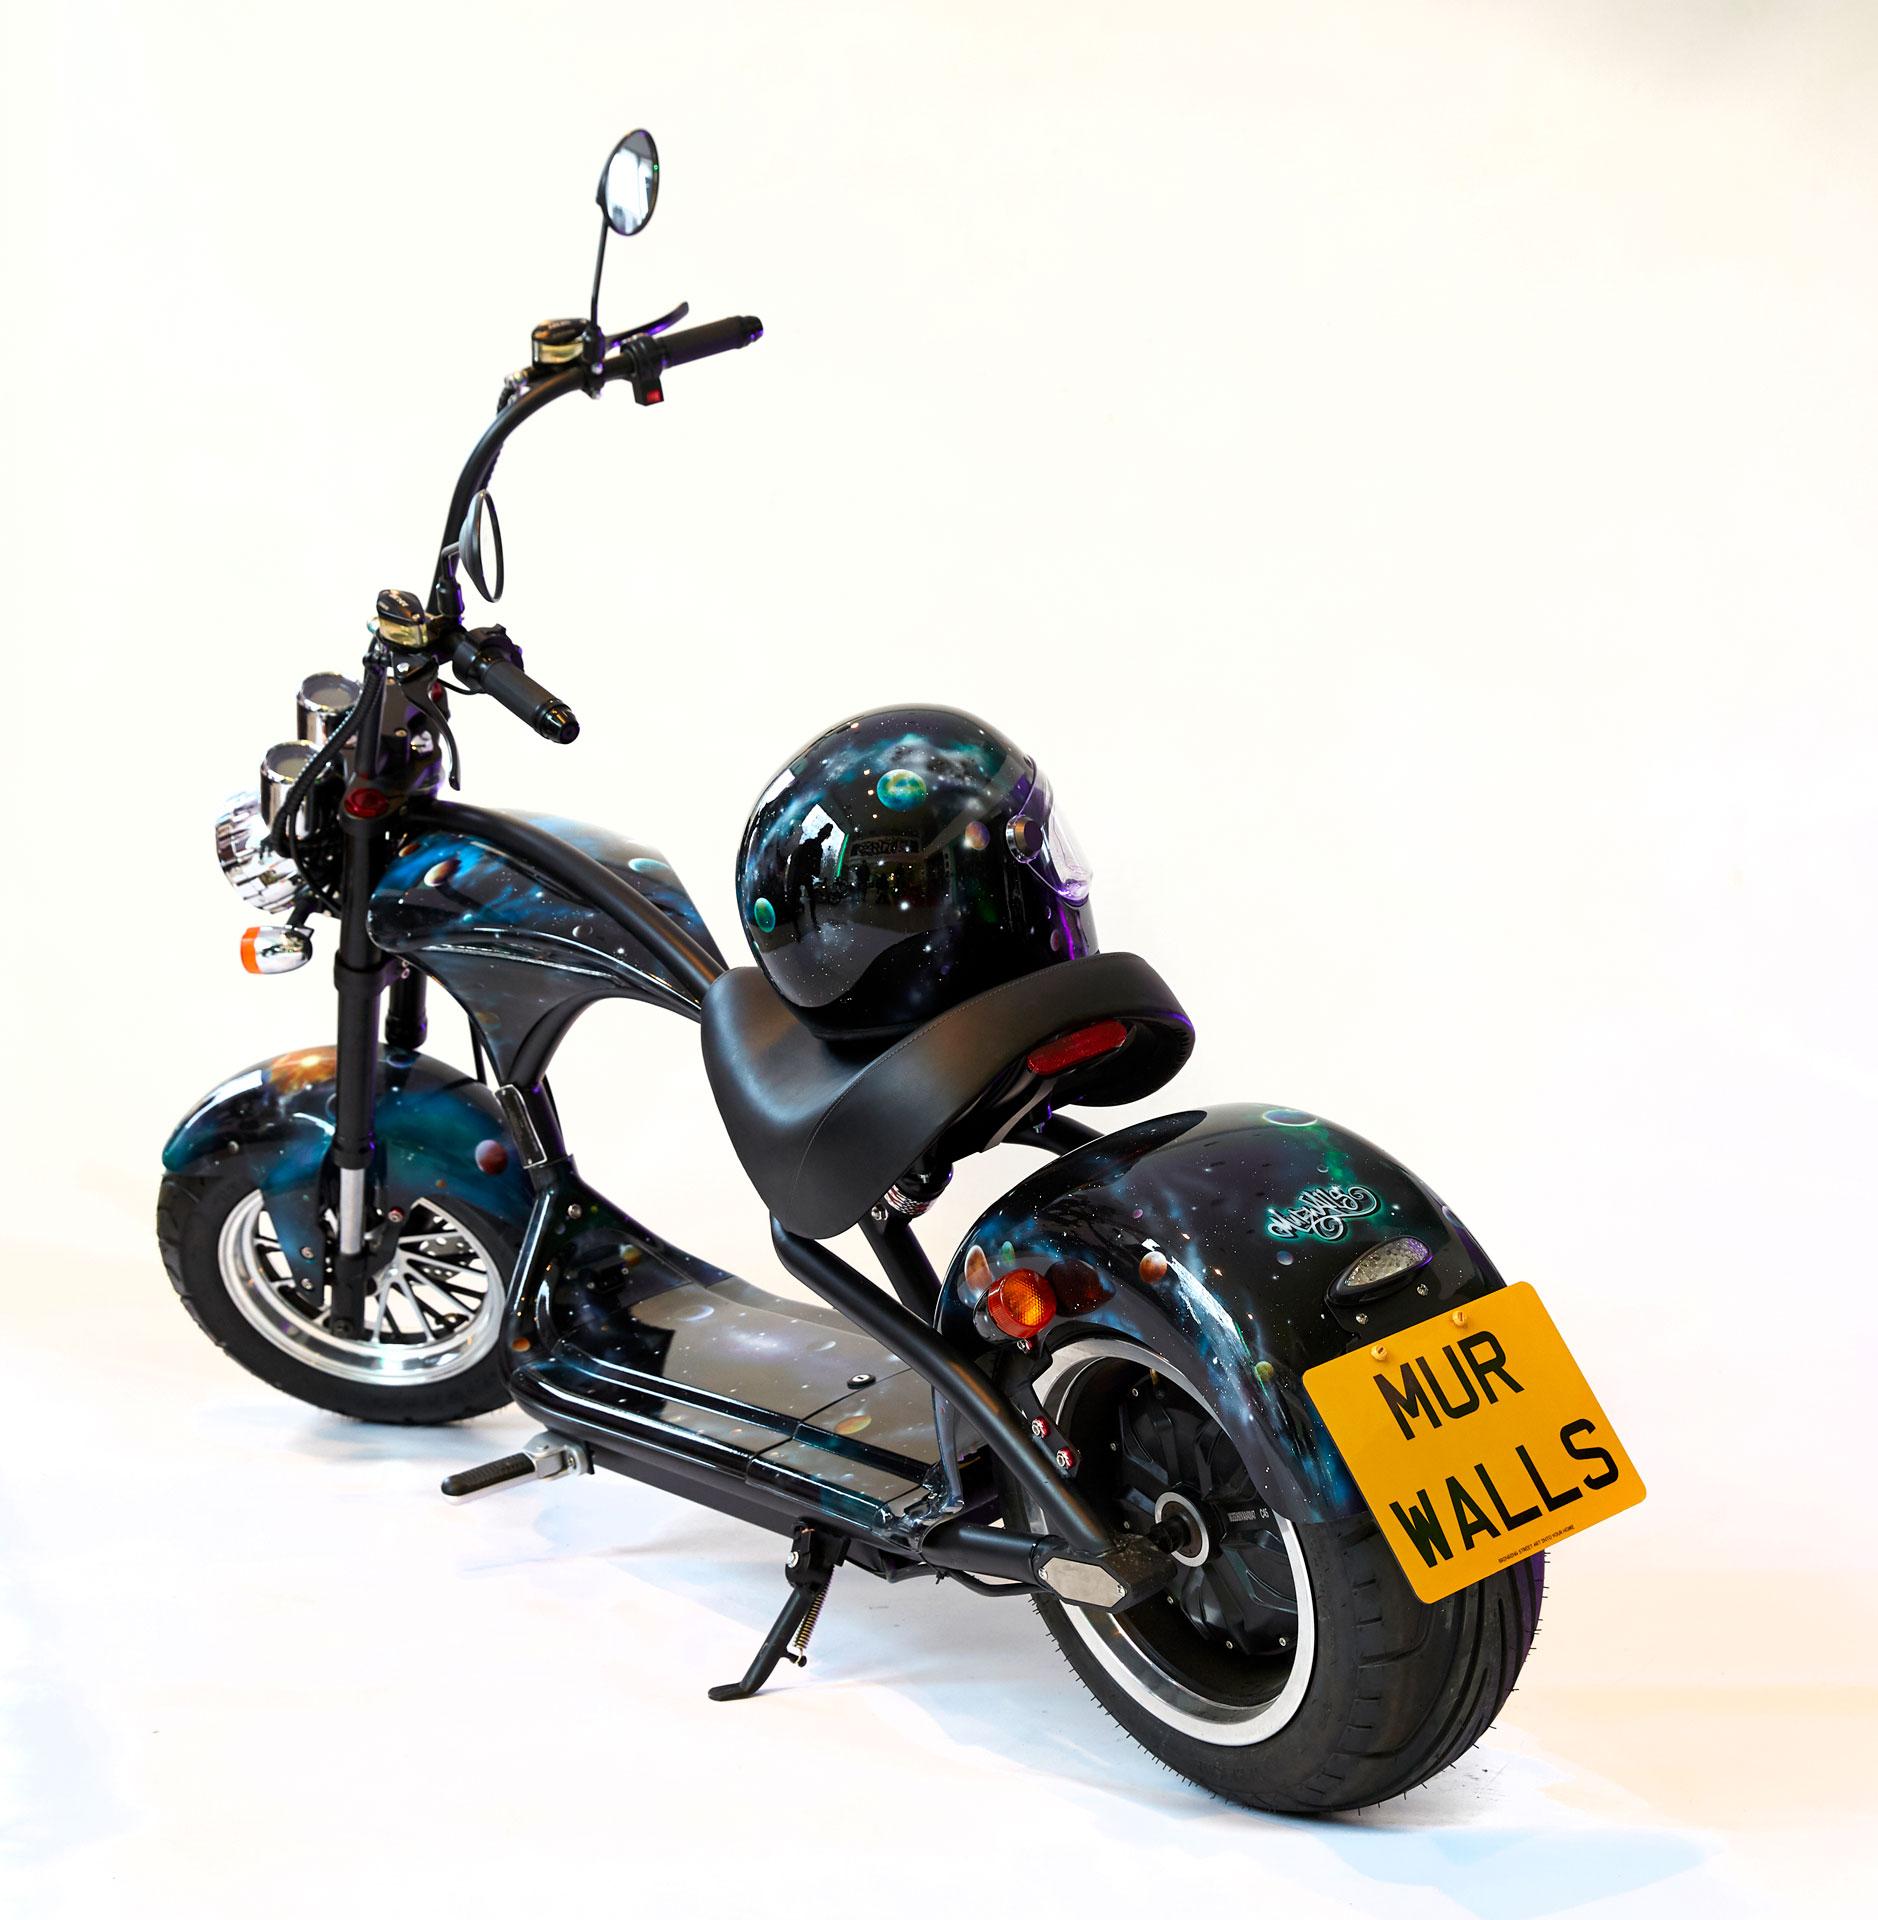 163-electric-bike-spaceart-airbrush-motorbike-art